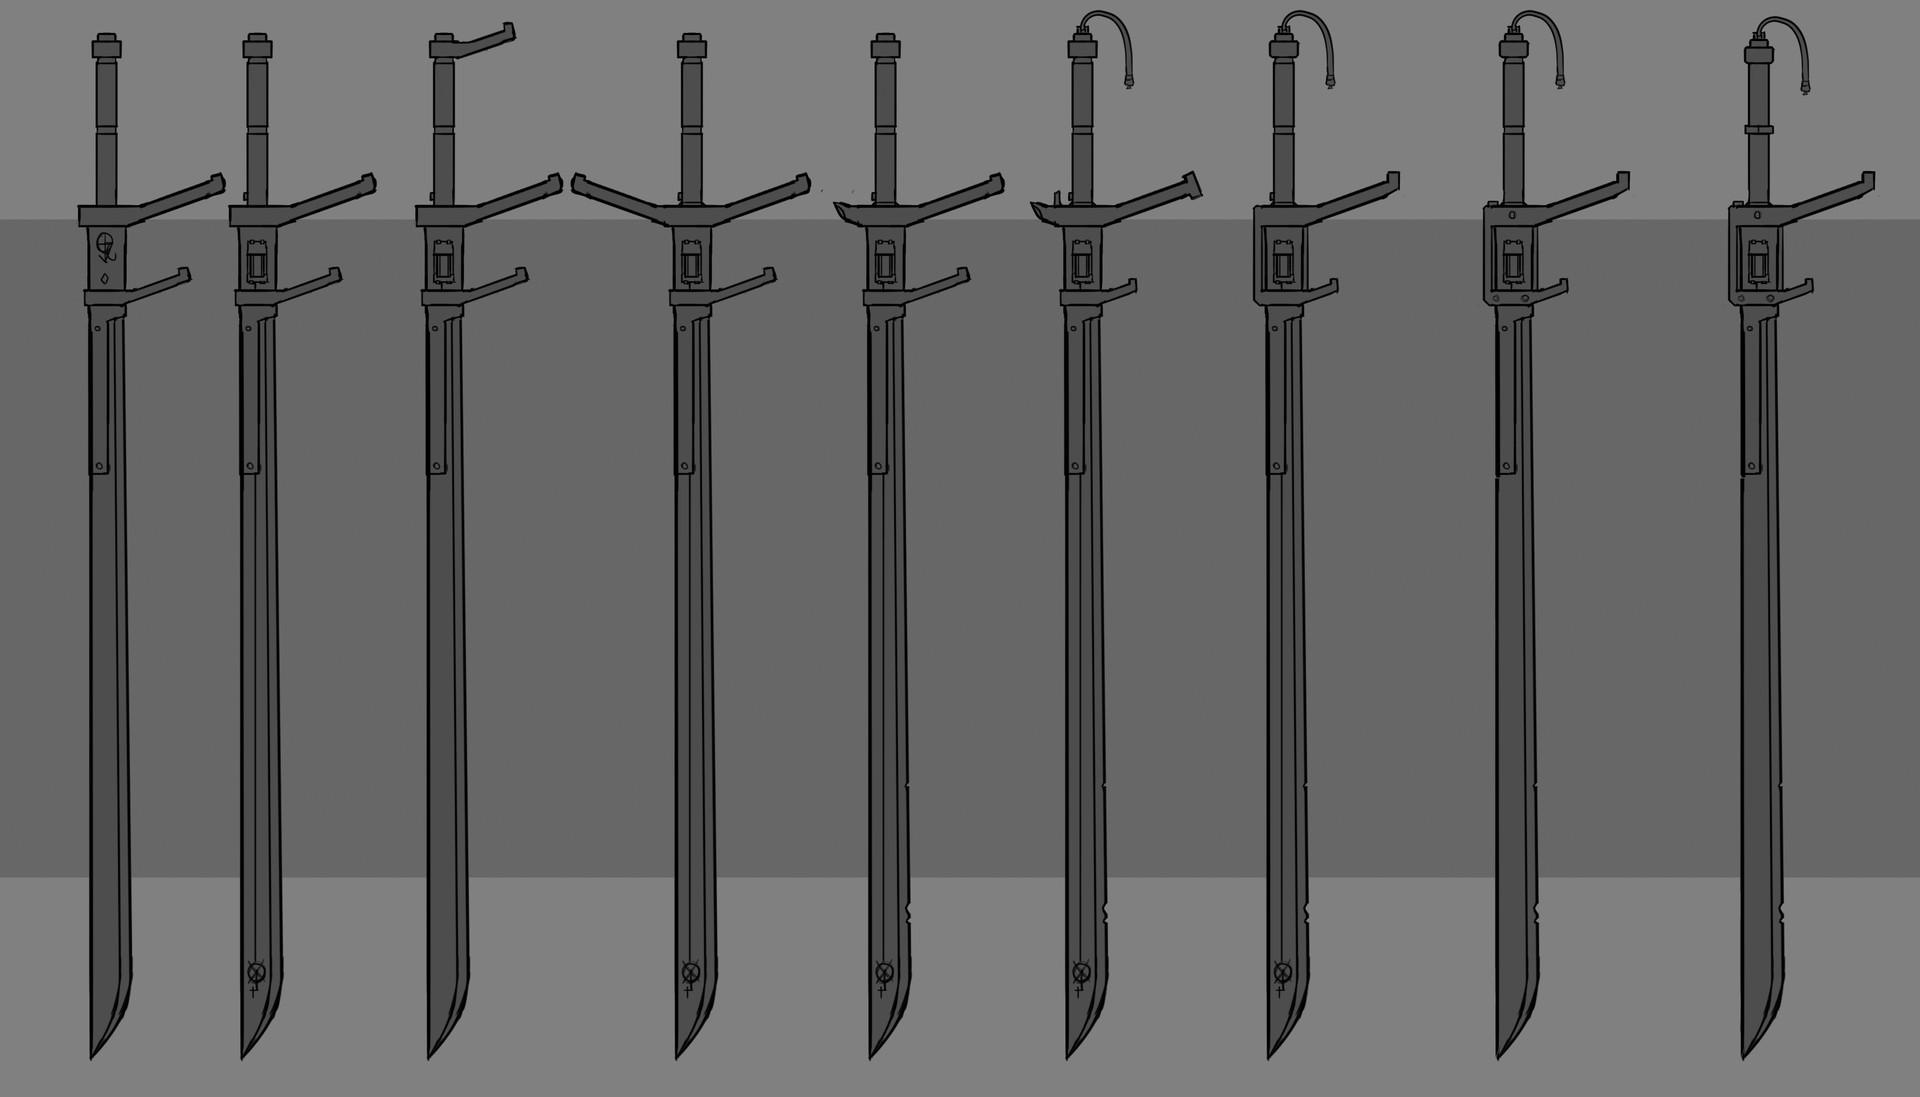 Hannah pallister 20170414 thea sword designs 4